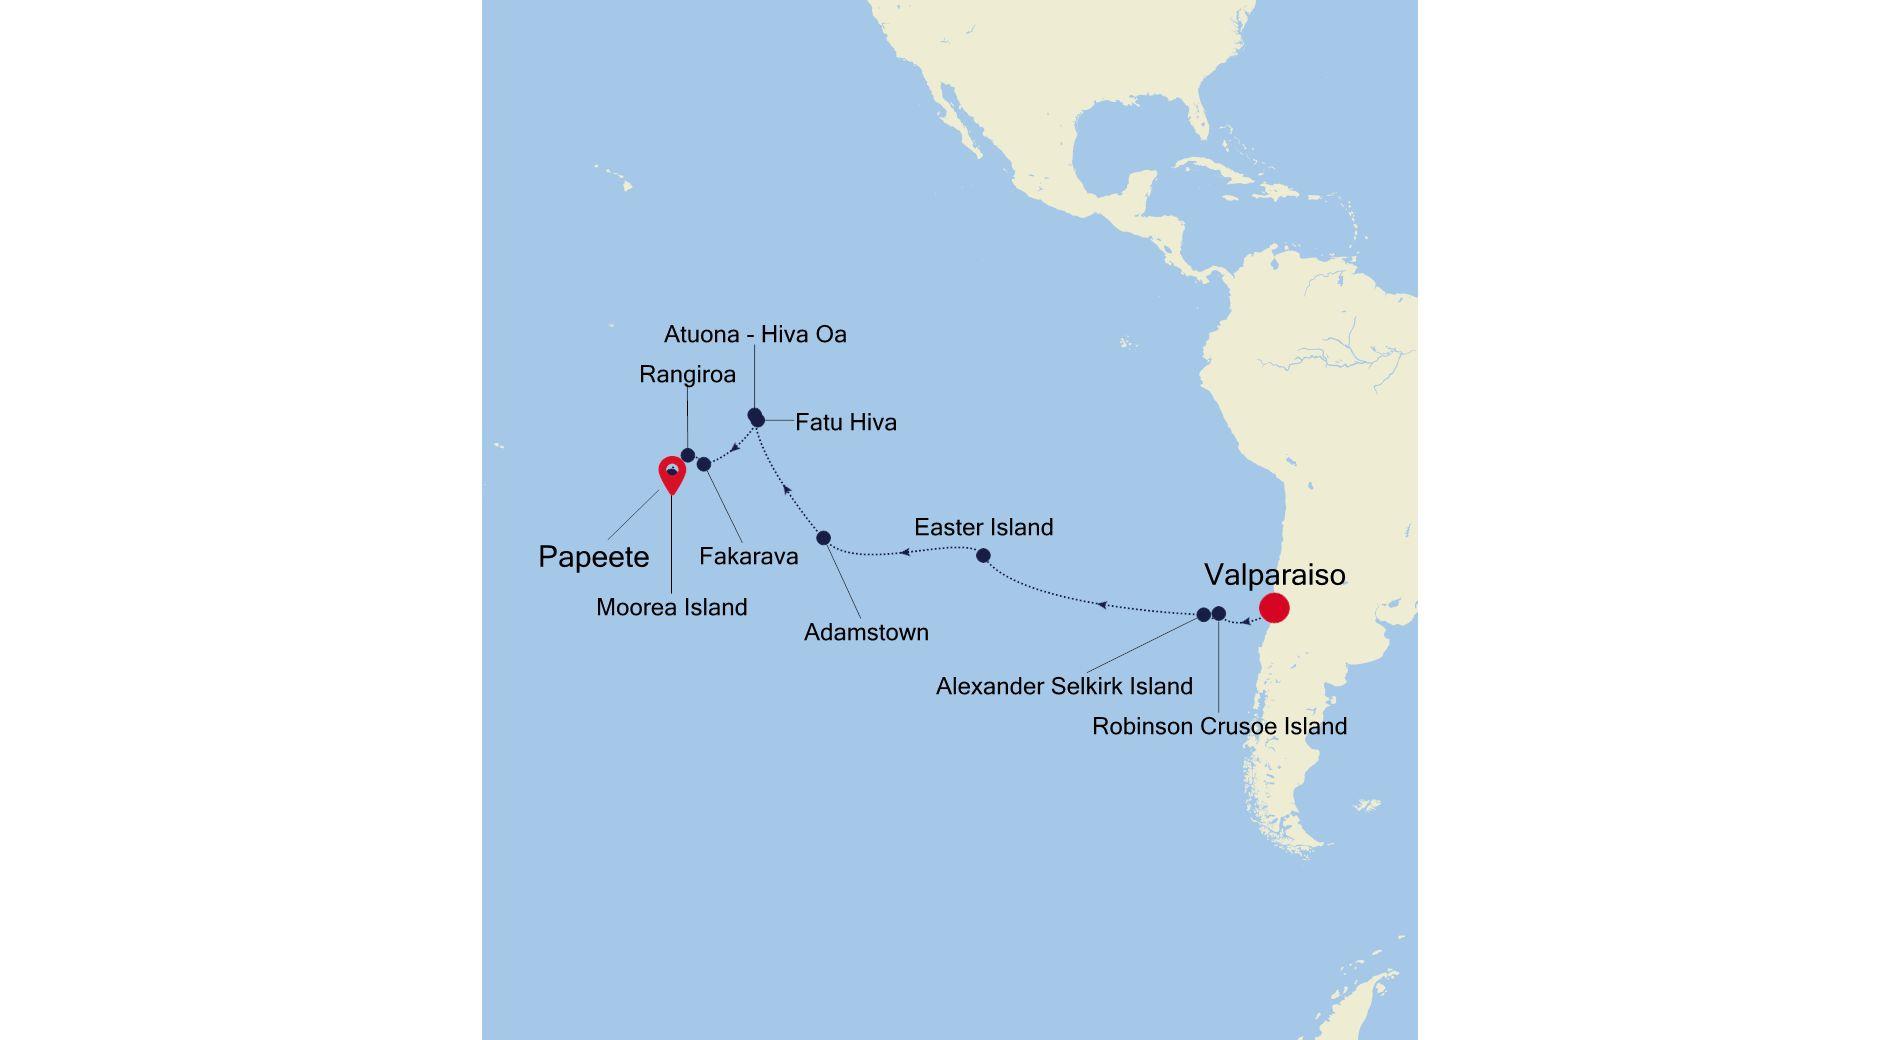 E4210217022 - Valparaiso a Papeete